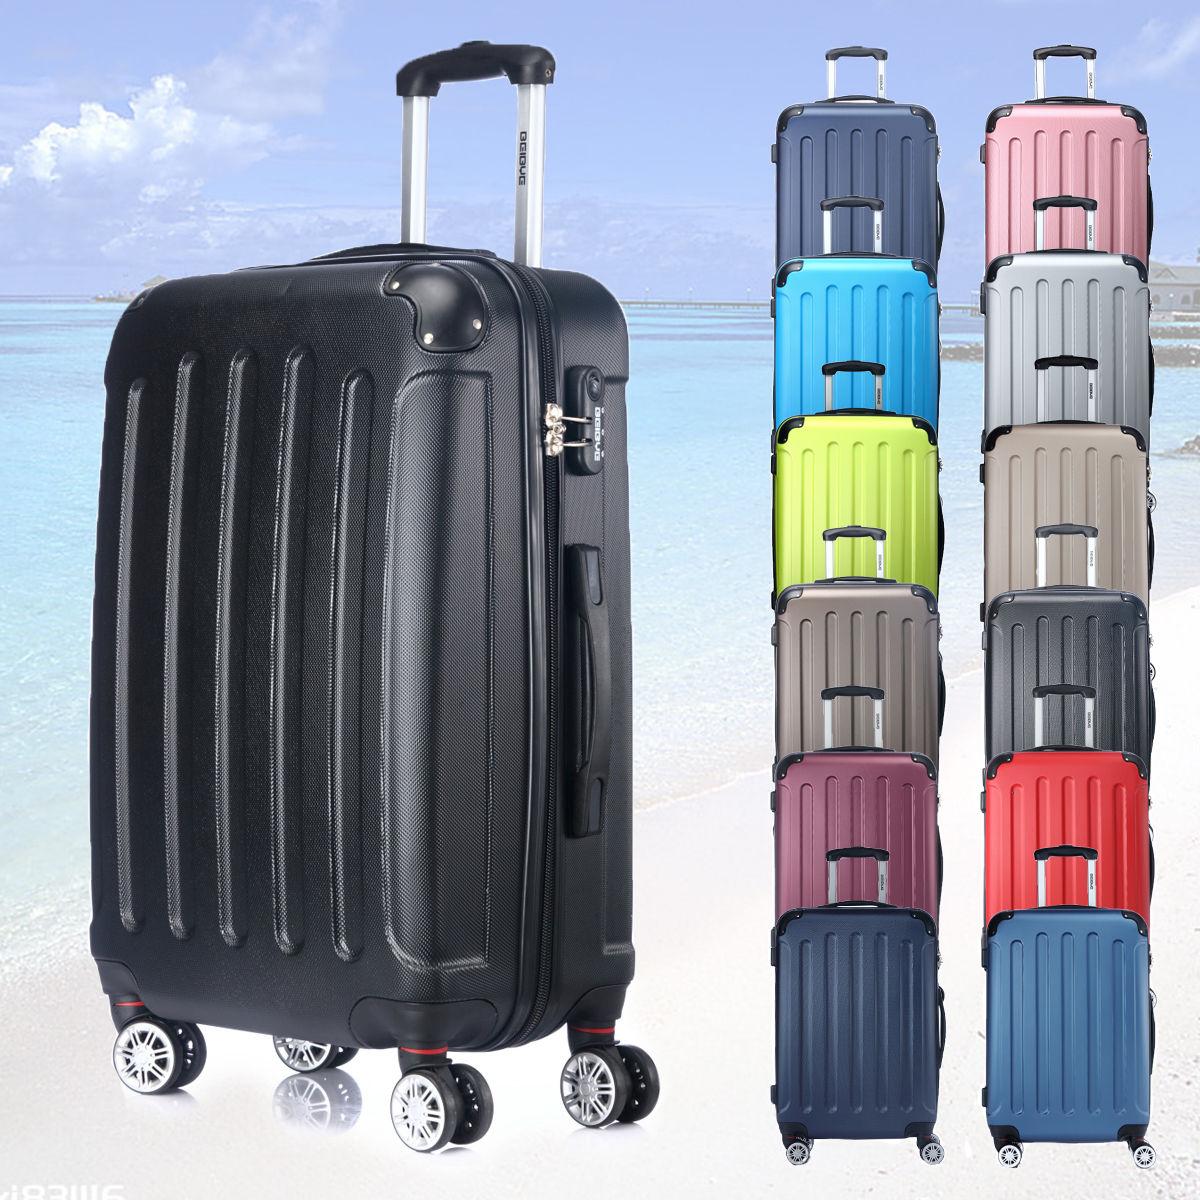 beibye reisekoffer koffer hersteller koffer handgep ck. Black Bedroom Furniture Sets. Home Design Ideas